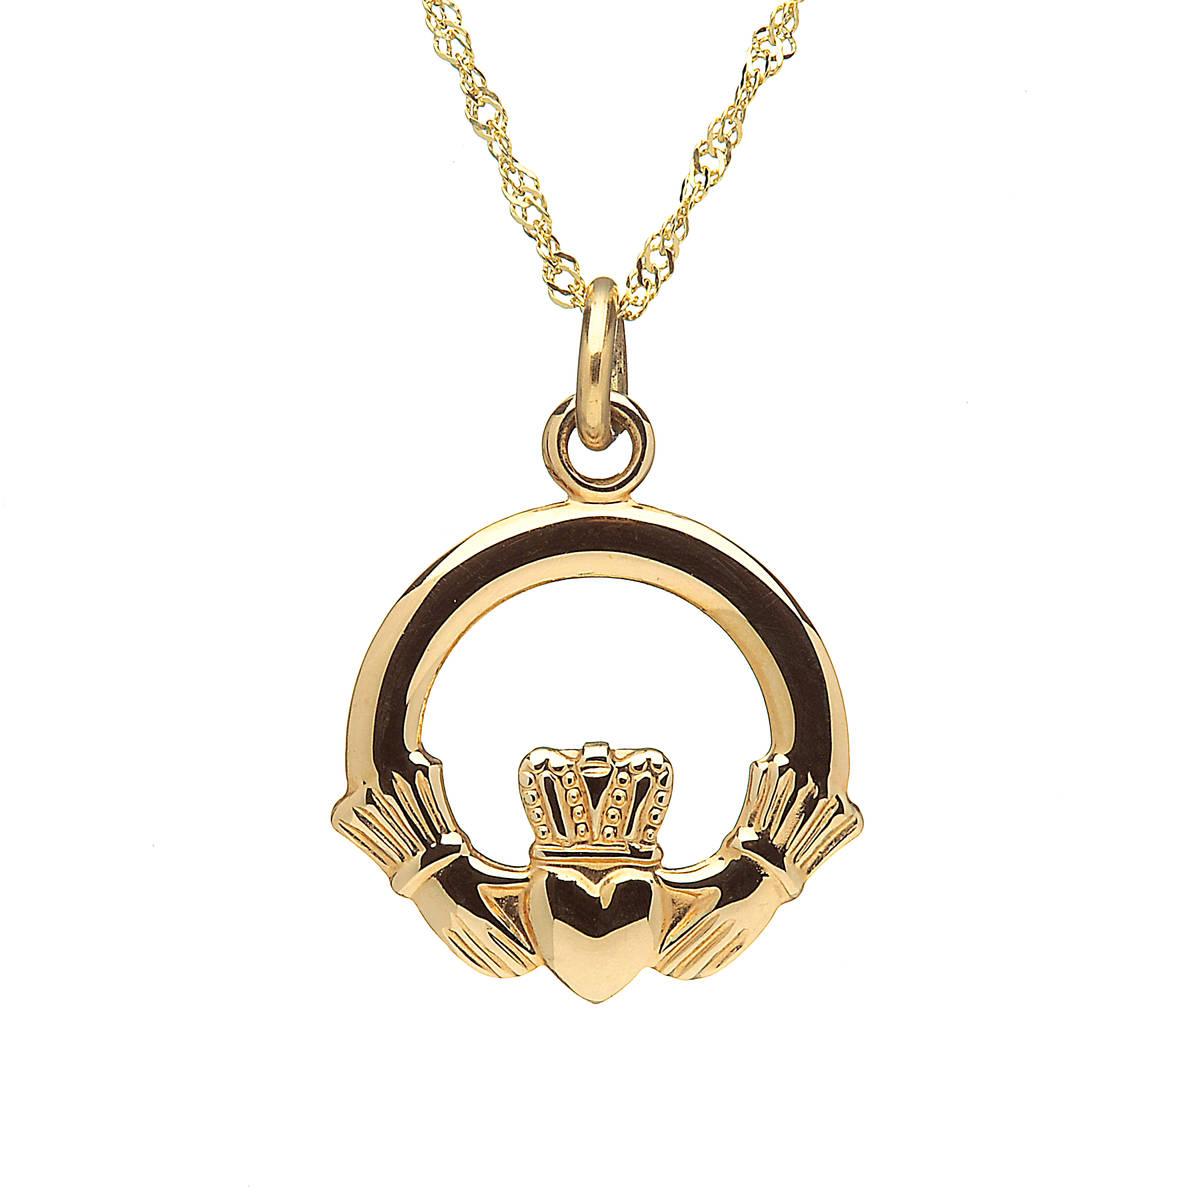 10 carat yellow gold claddagh charm on chain.